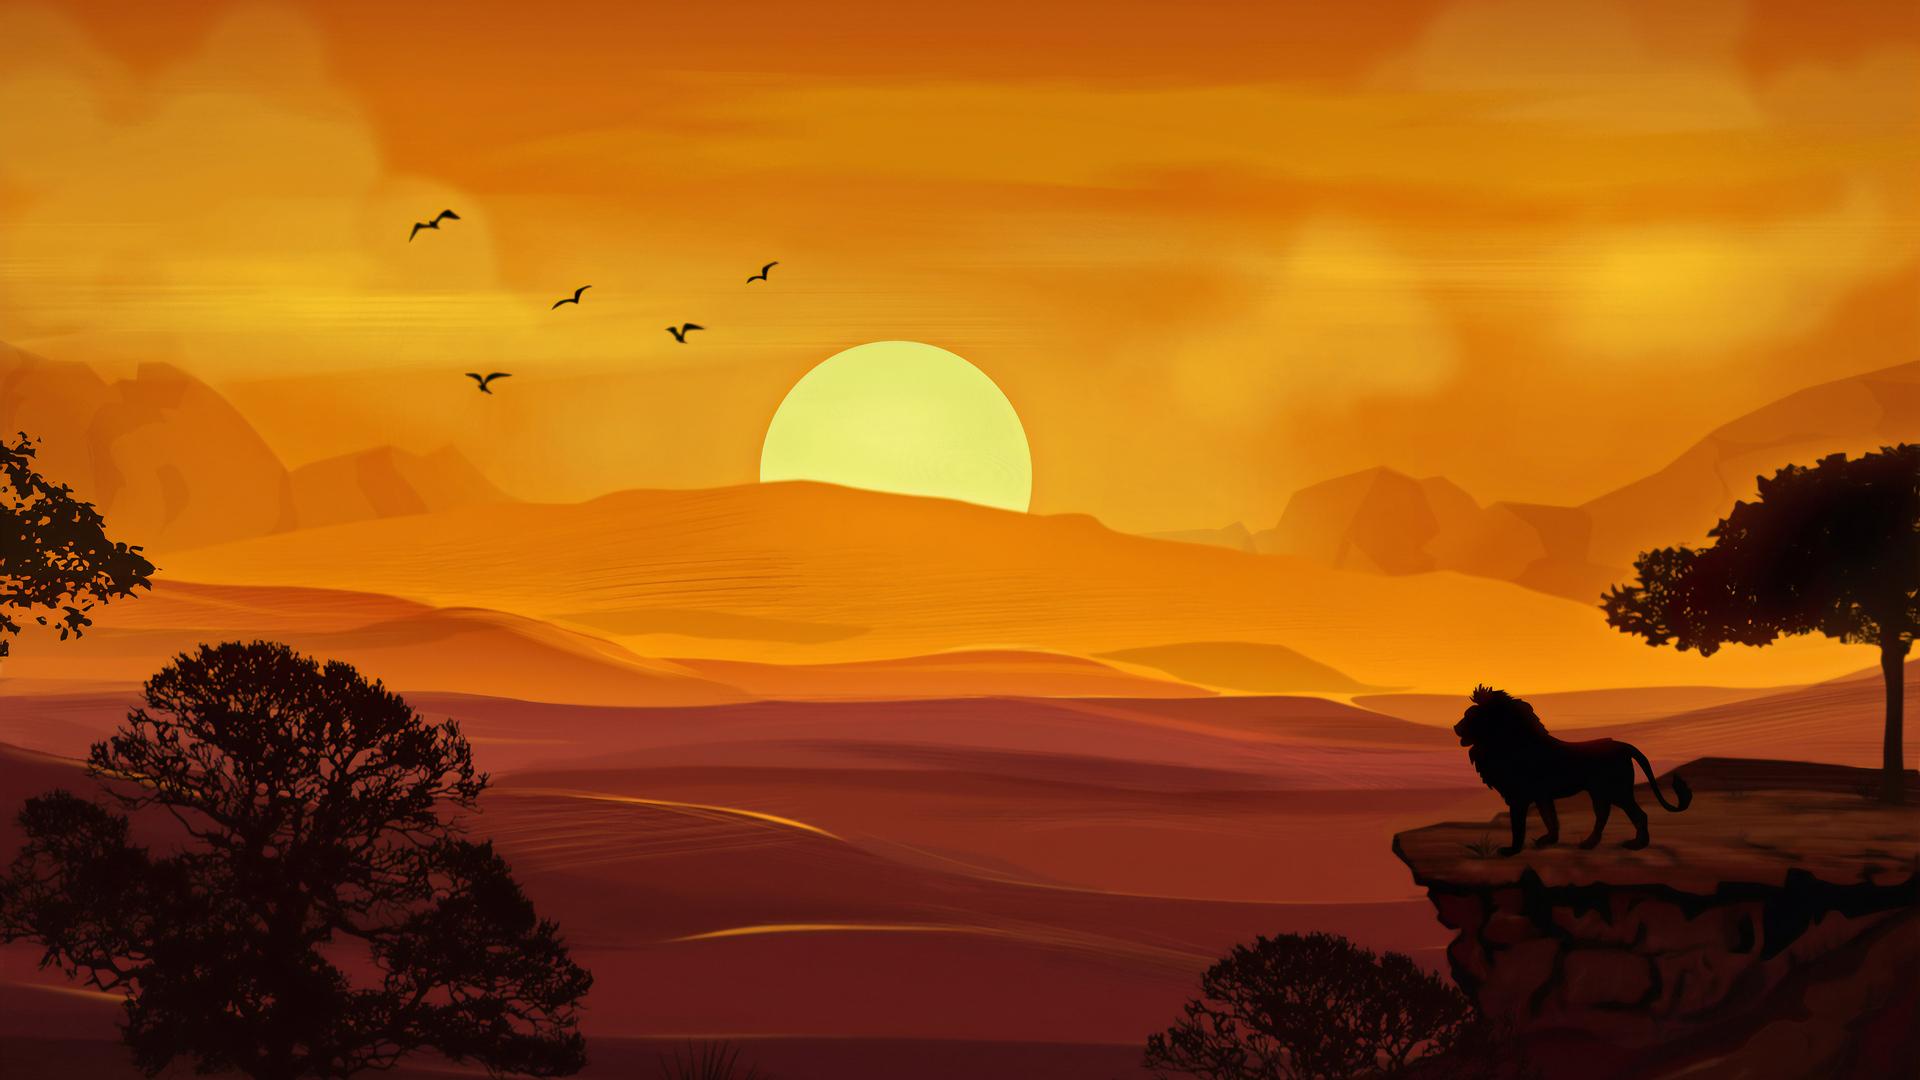 1920x1080 Forest Lion Morning Sunrise Illustration 4k Laptop